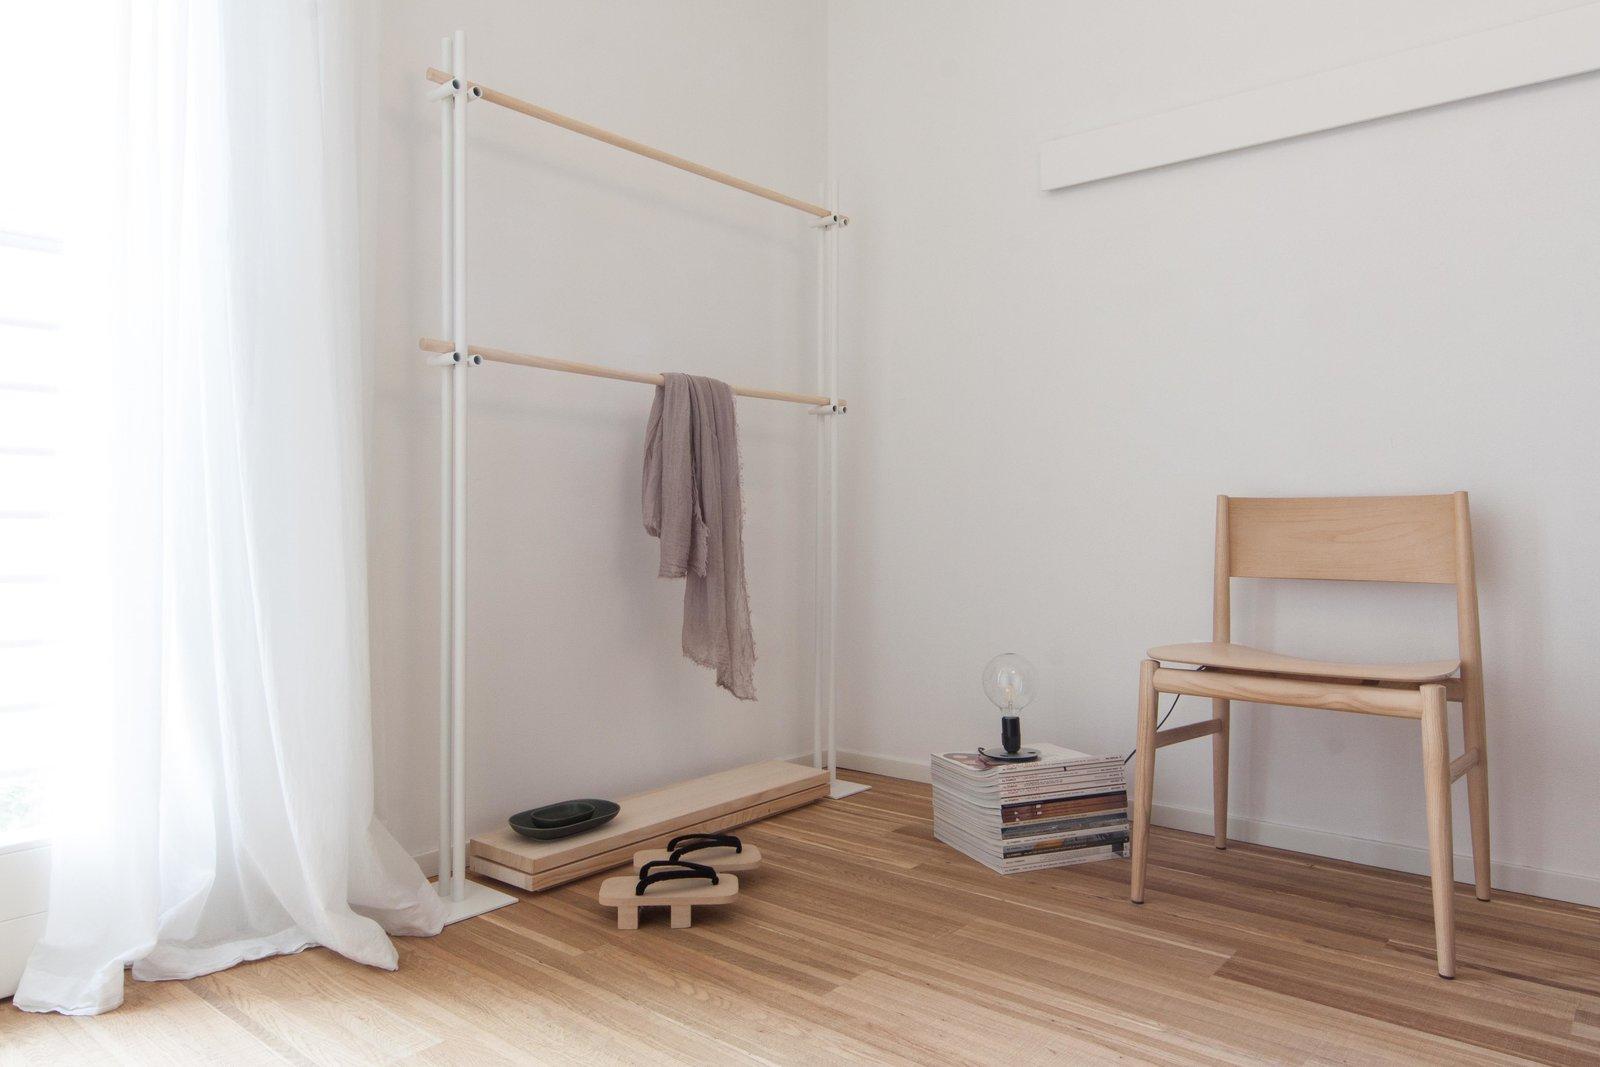 Bedroom, Dresser, Chair, Shelves, Lamps, Floor Lighting, Wall Lighting, and Medium Hardwood Floor  Interior LP by Didonè Comacchio